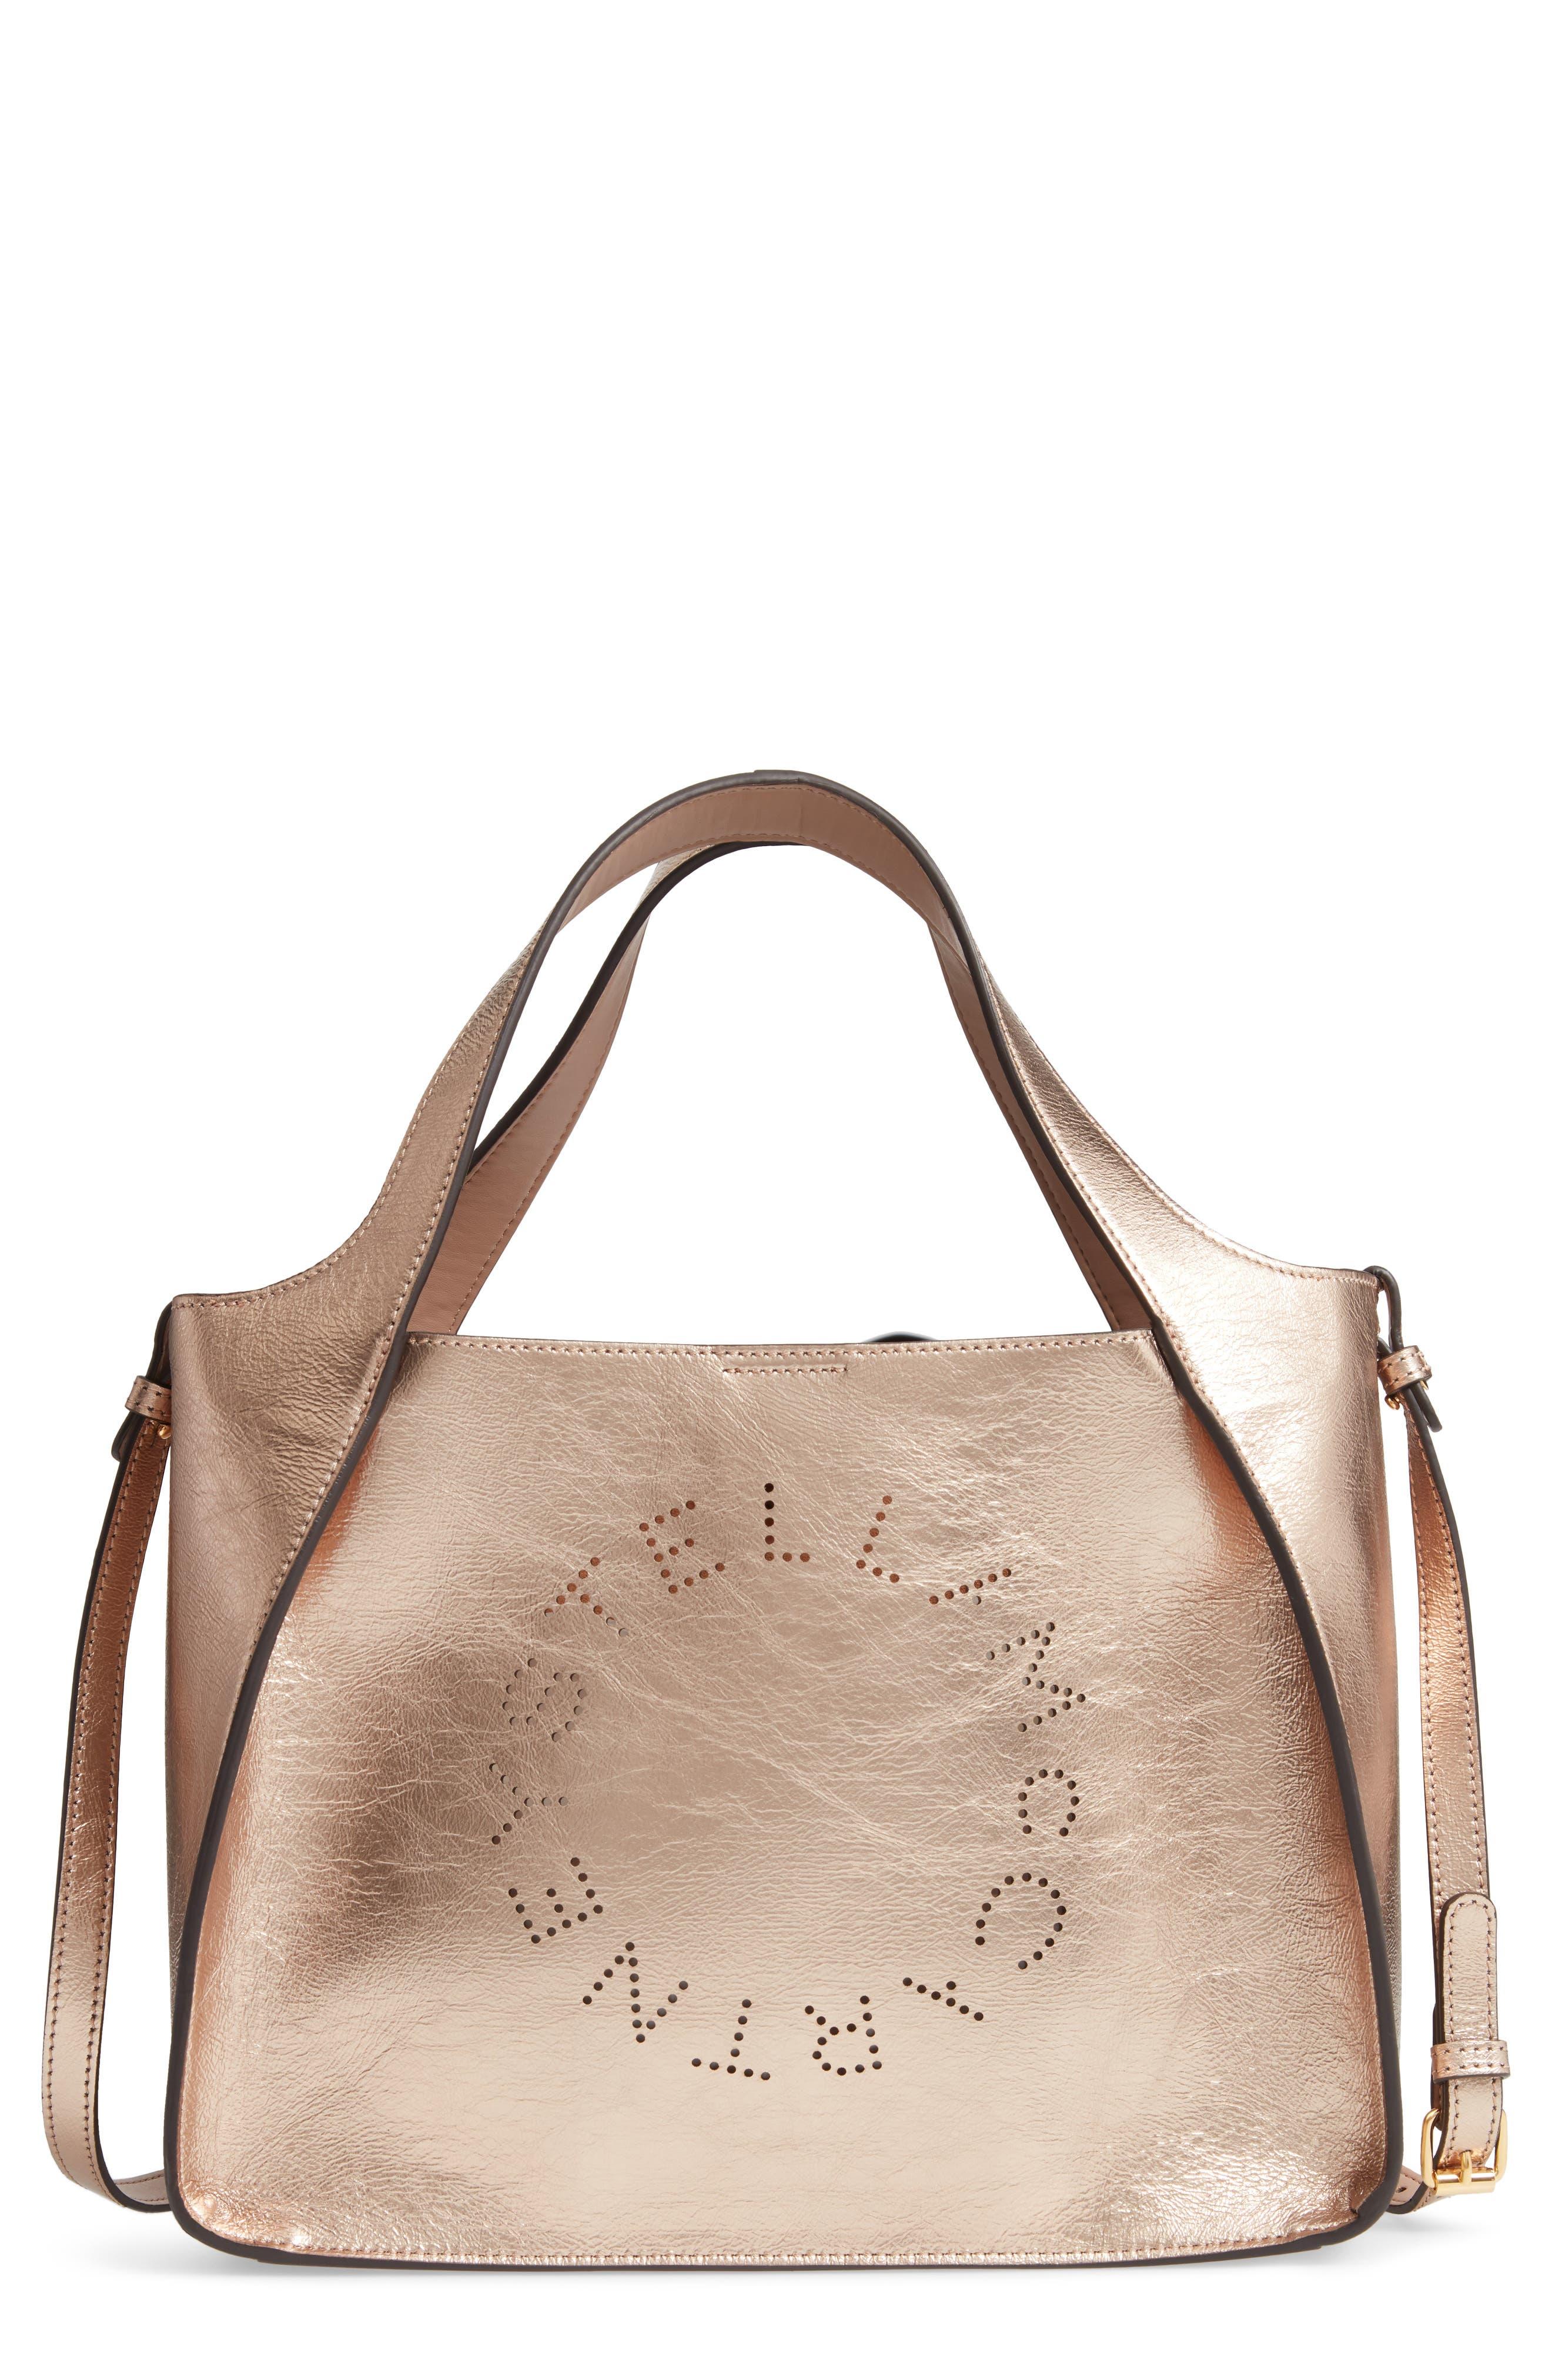 STELLA MCCARTNEY, Perforated Logo Metallic Faux Leather Satchel, Main thumbnail 1, color, ROSE GOLD